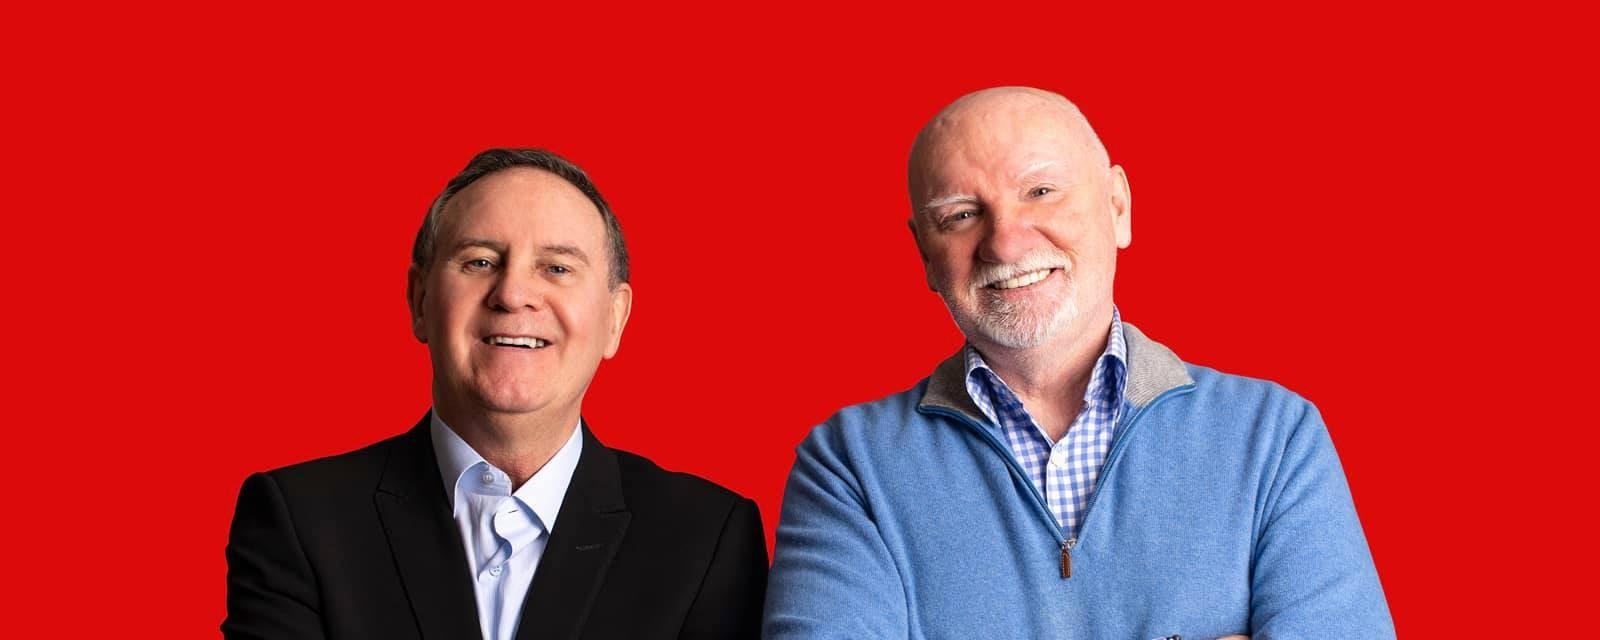 Hunter & Haughey, hosts of the Go Radio Business Show.